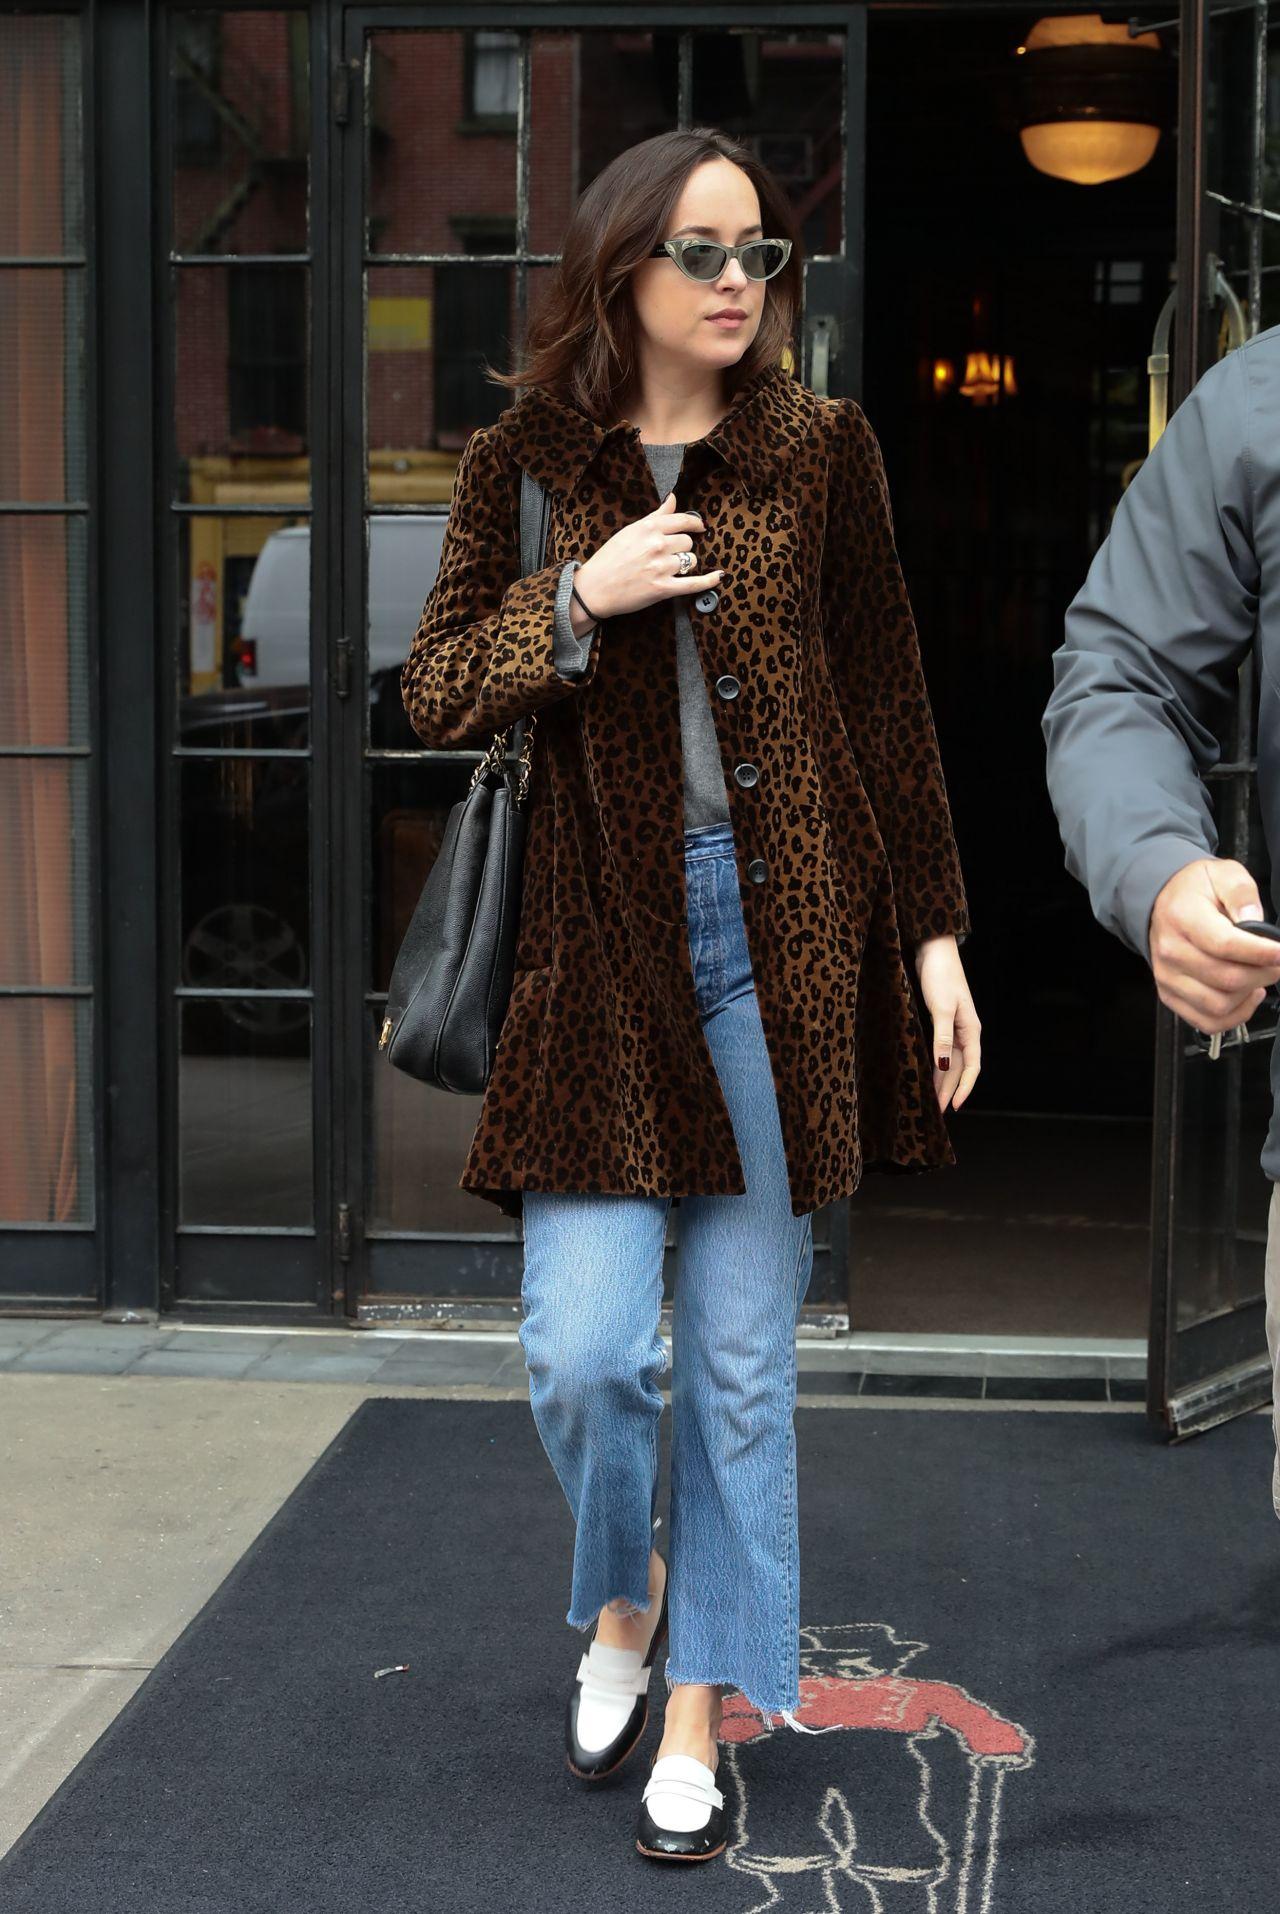 photo Dakota johnson leaving the bowery hotel in nyc